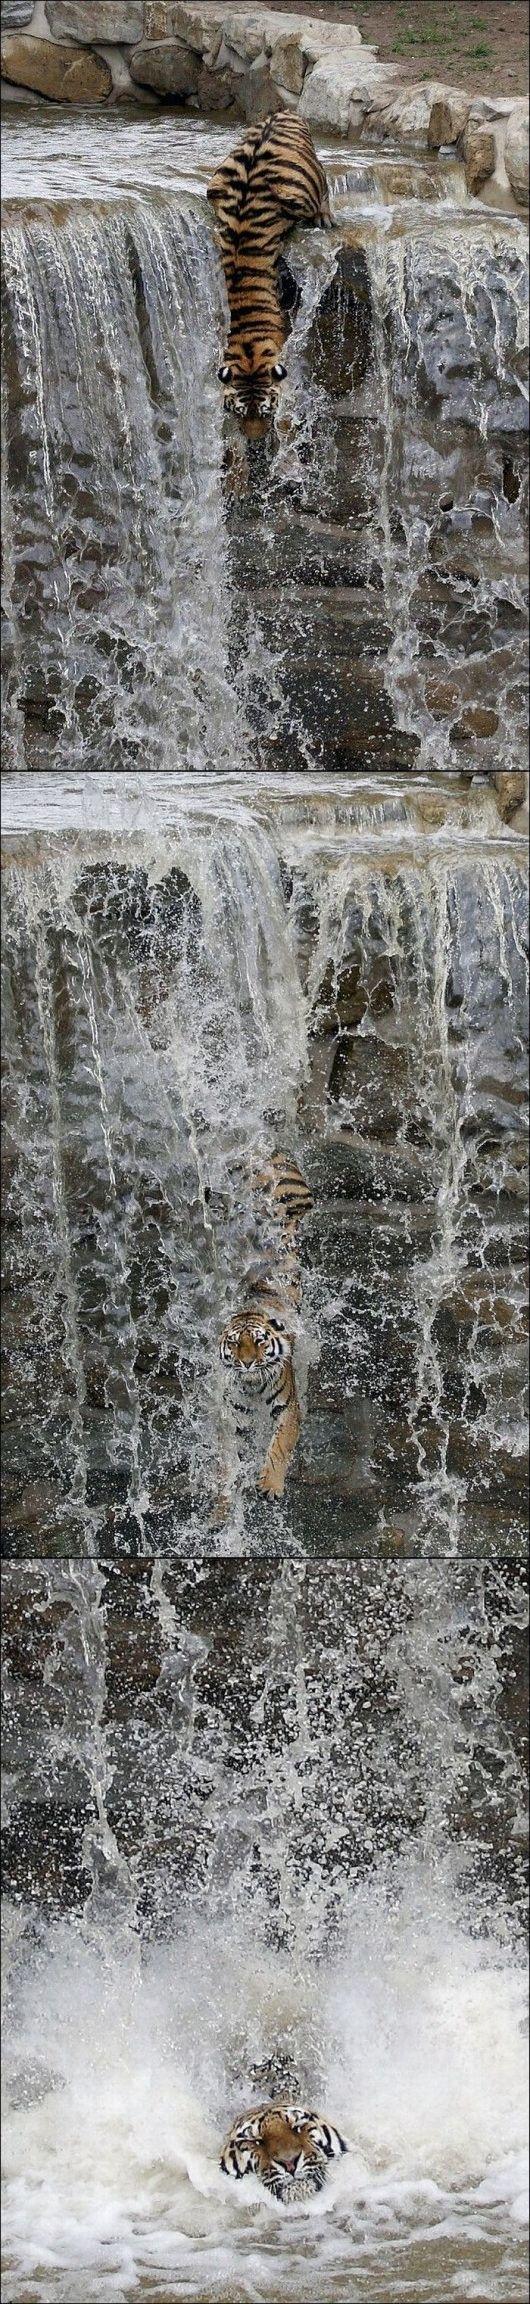 Tigers take the plunge!